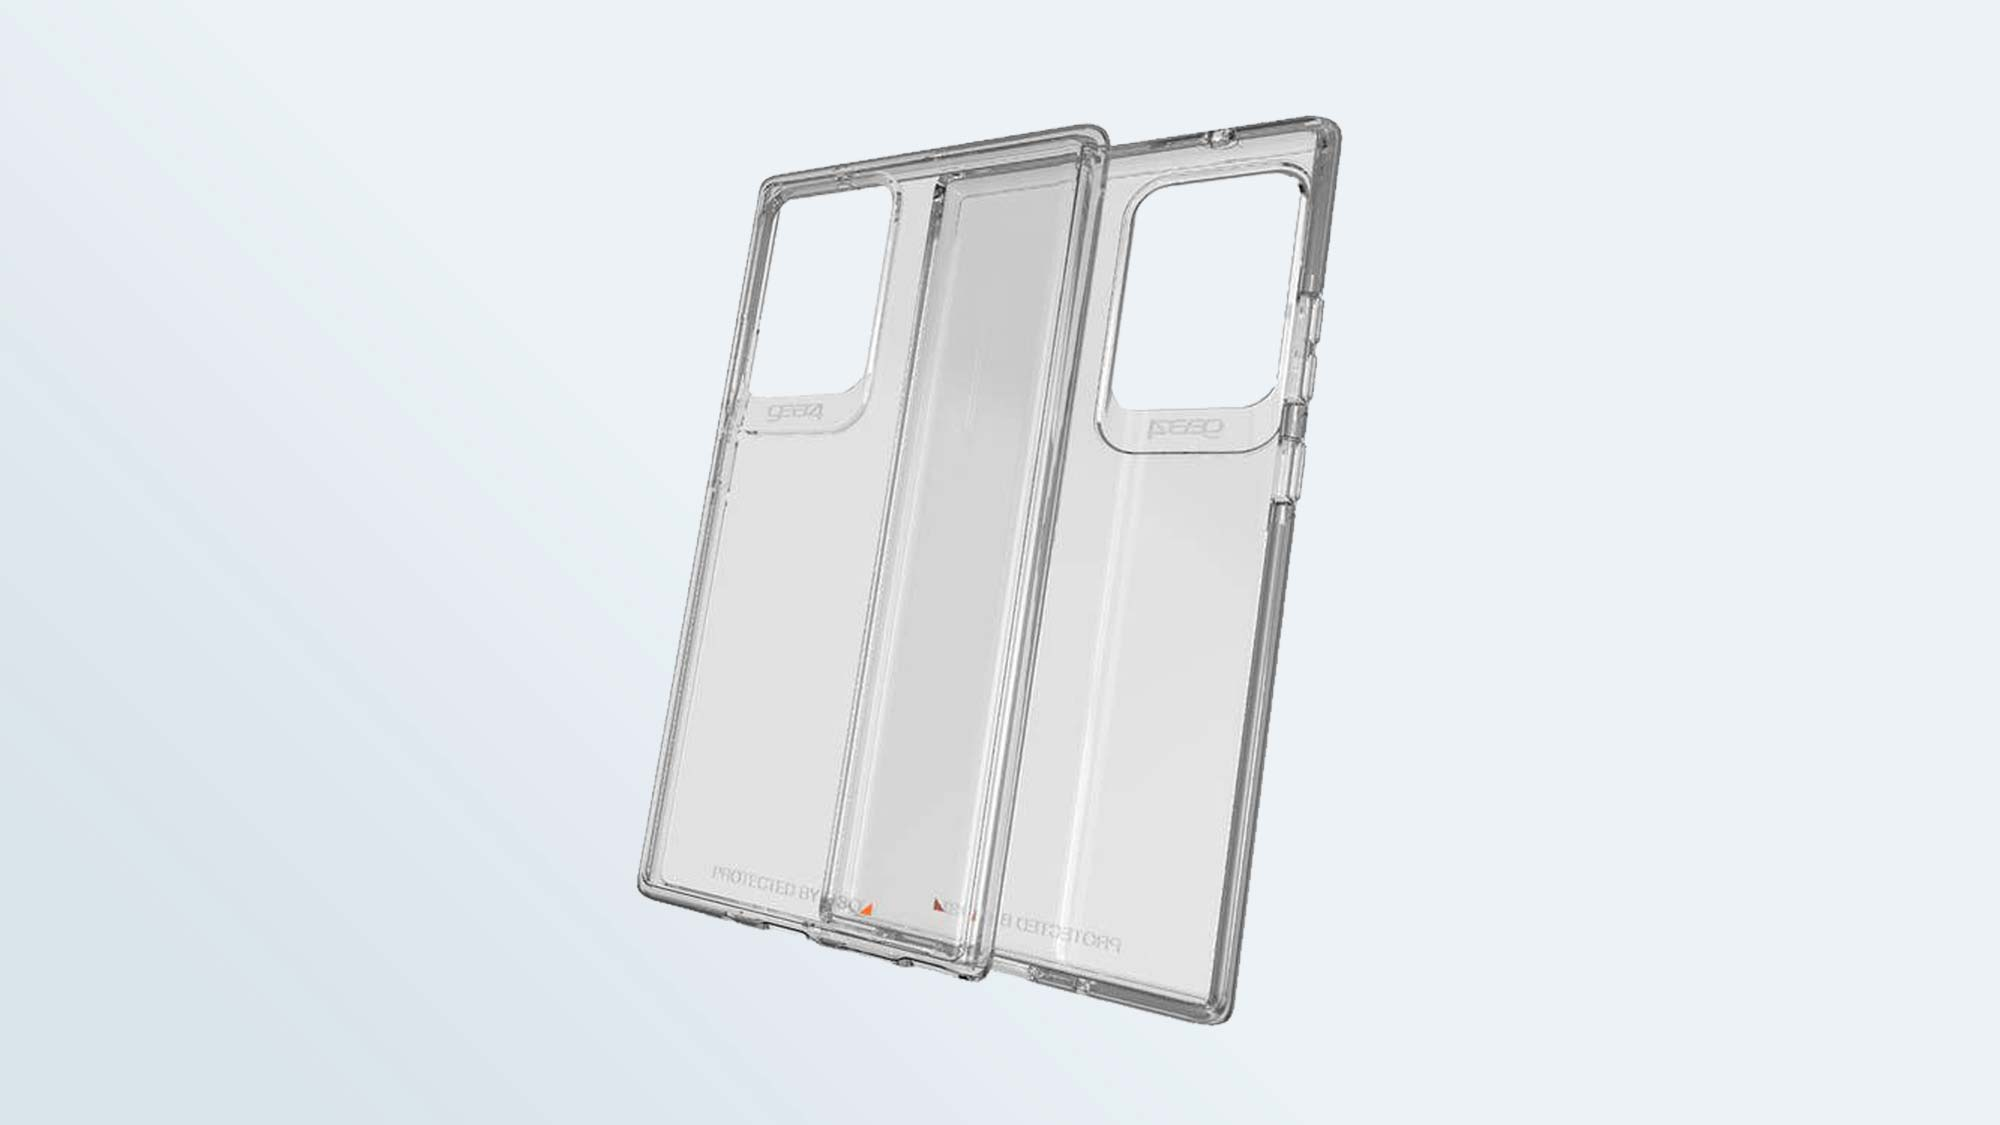 Лучшие чехлы для Samsung Galaxy Note 20 Ultra: Gear4 Crystal Palace